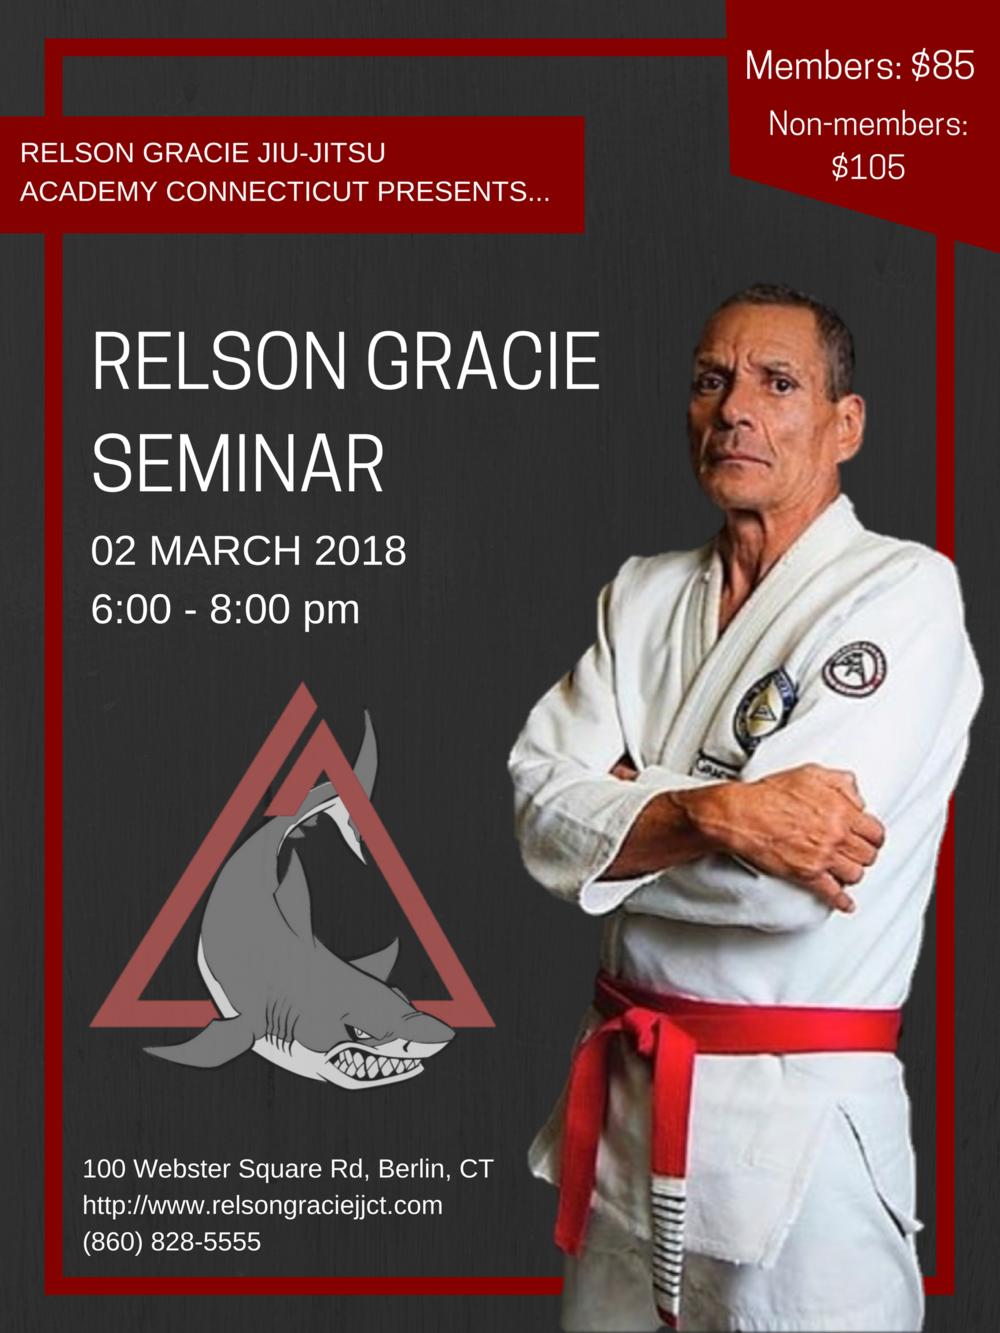 Relson Gracie Seminar.png